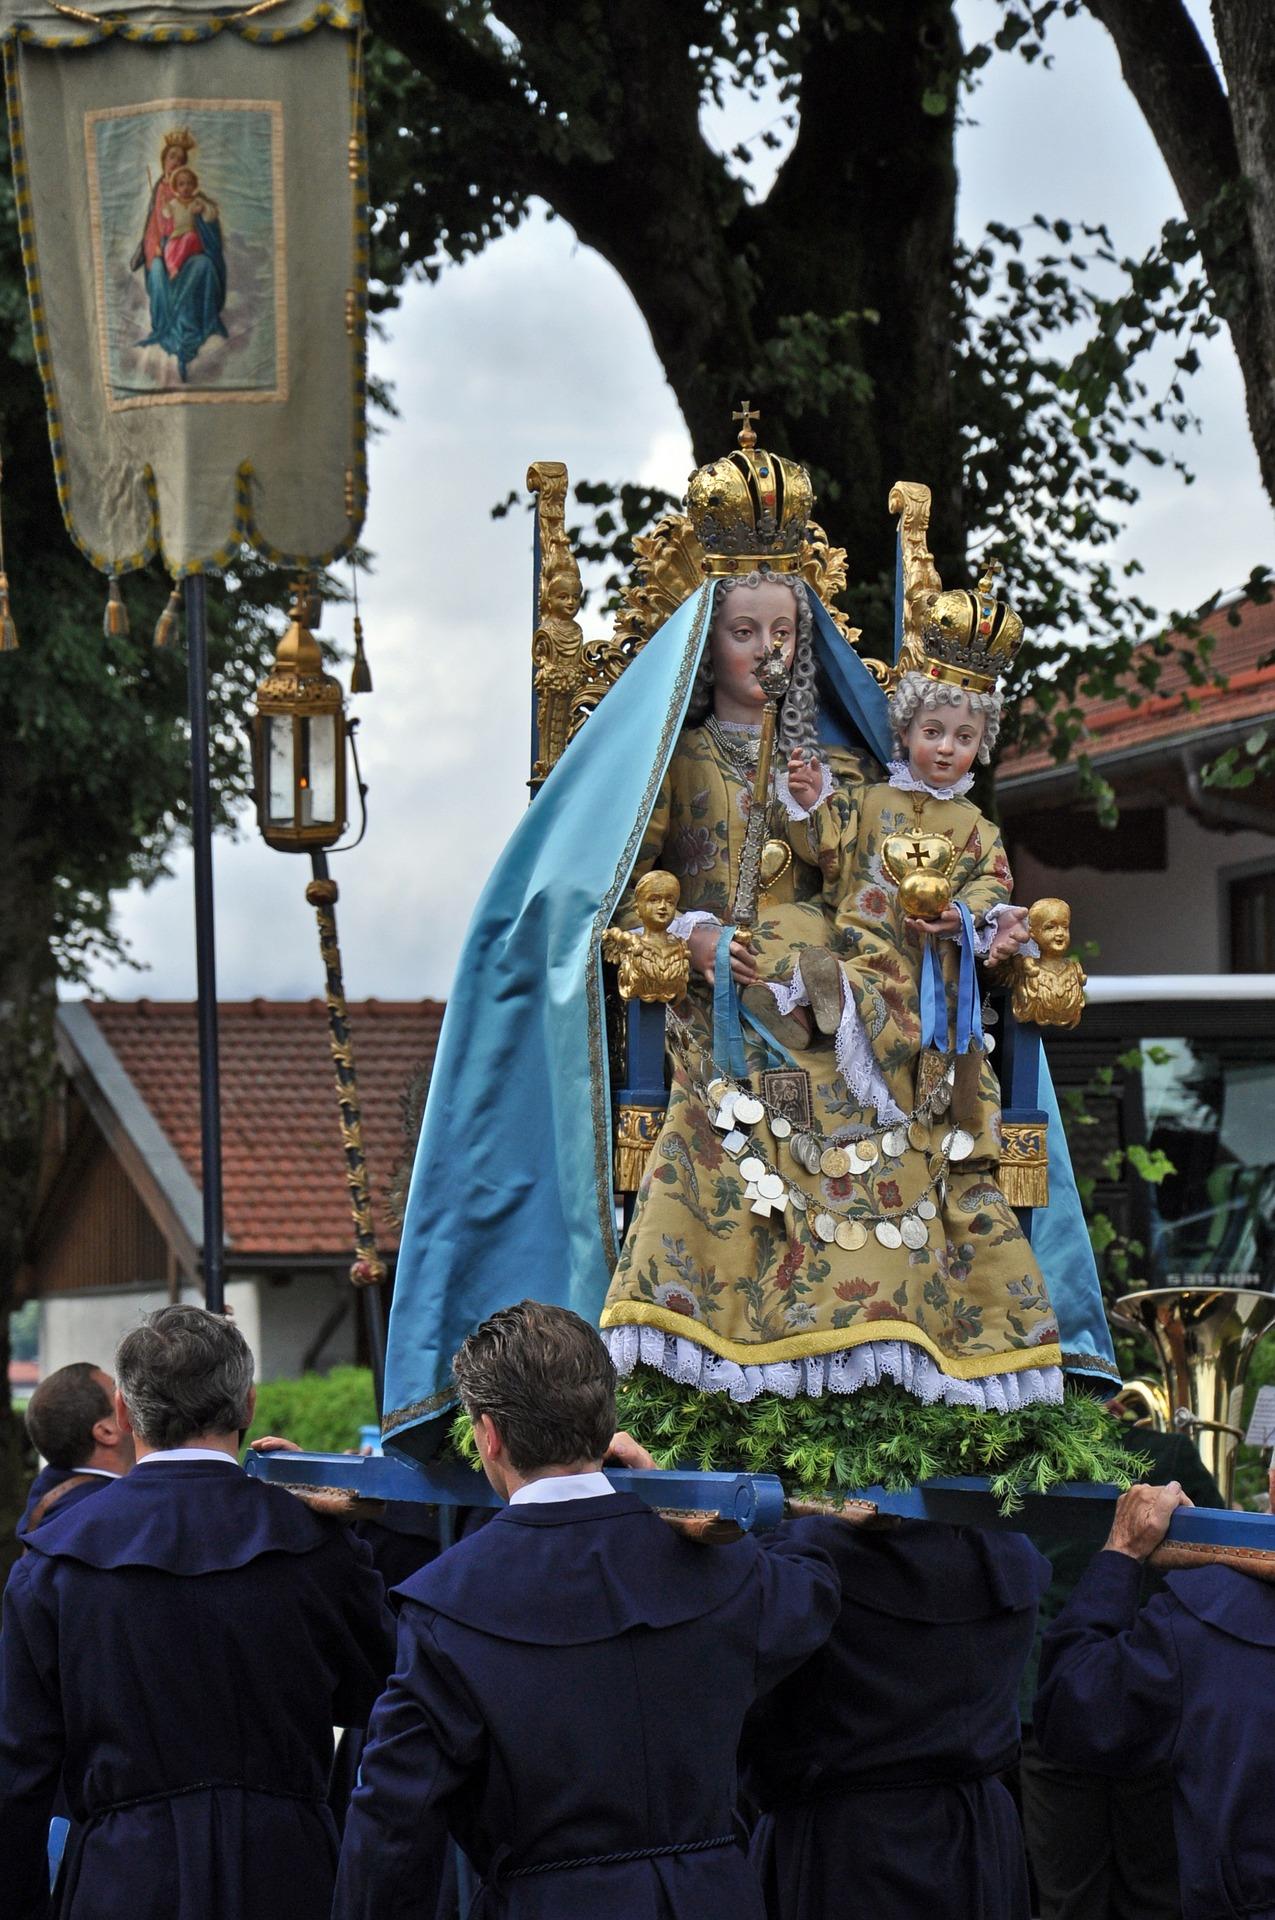 Fronleichnam Procession